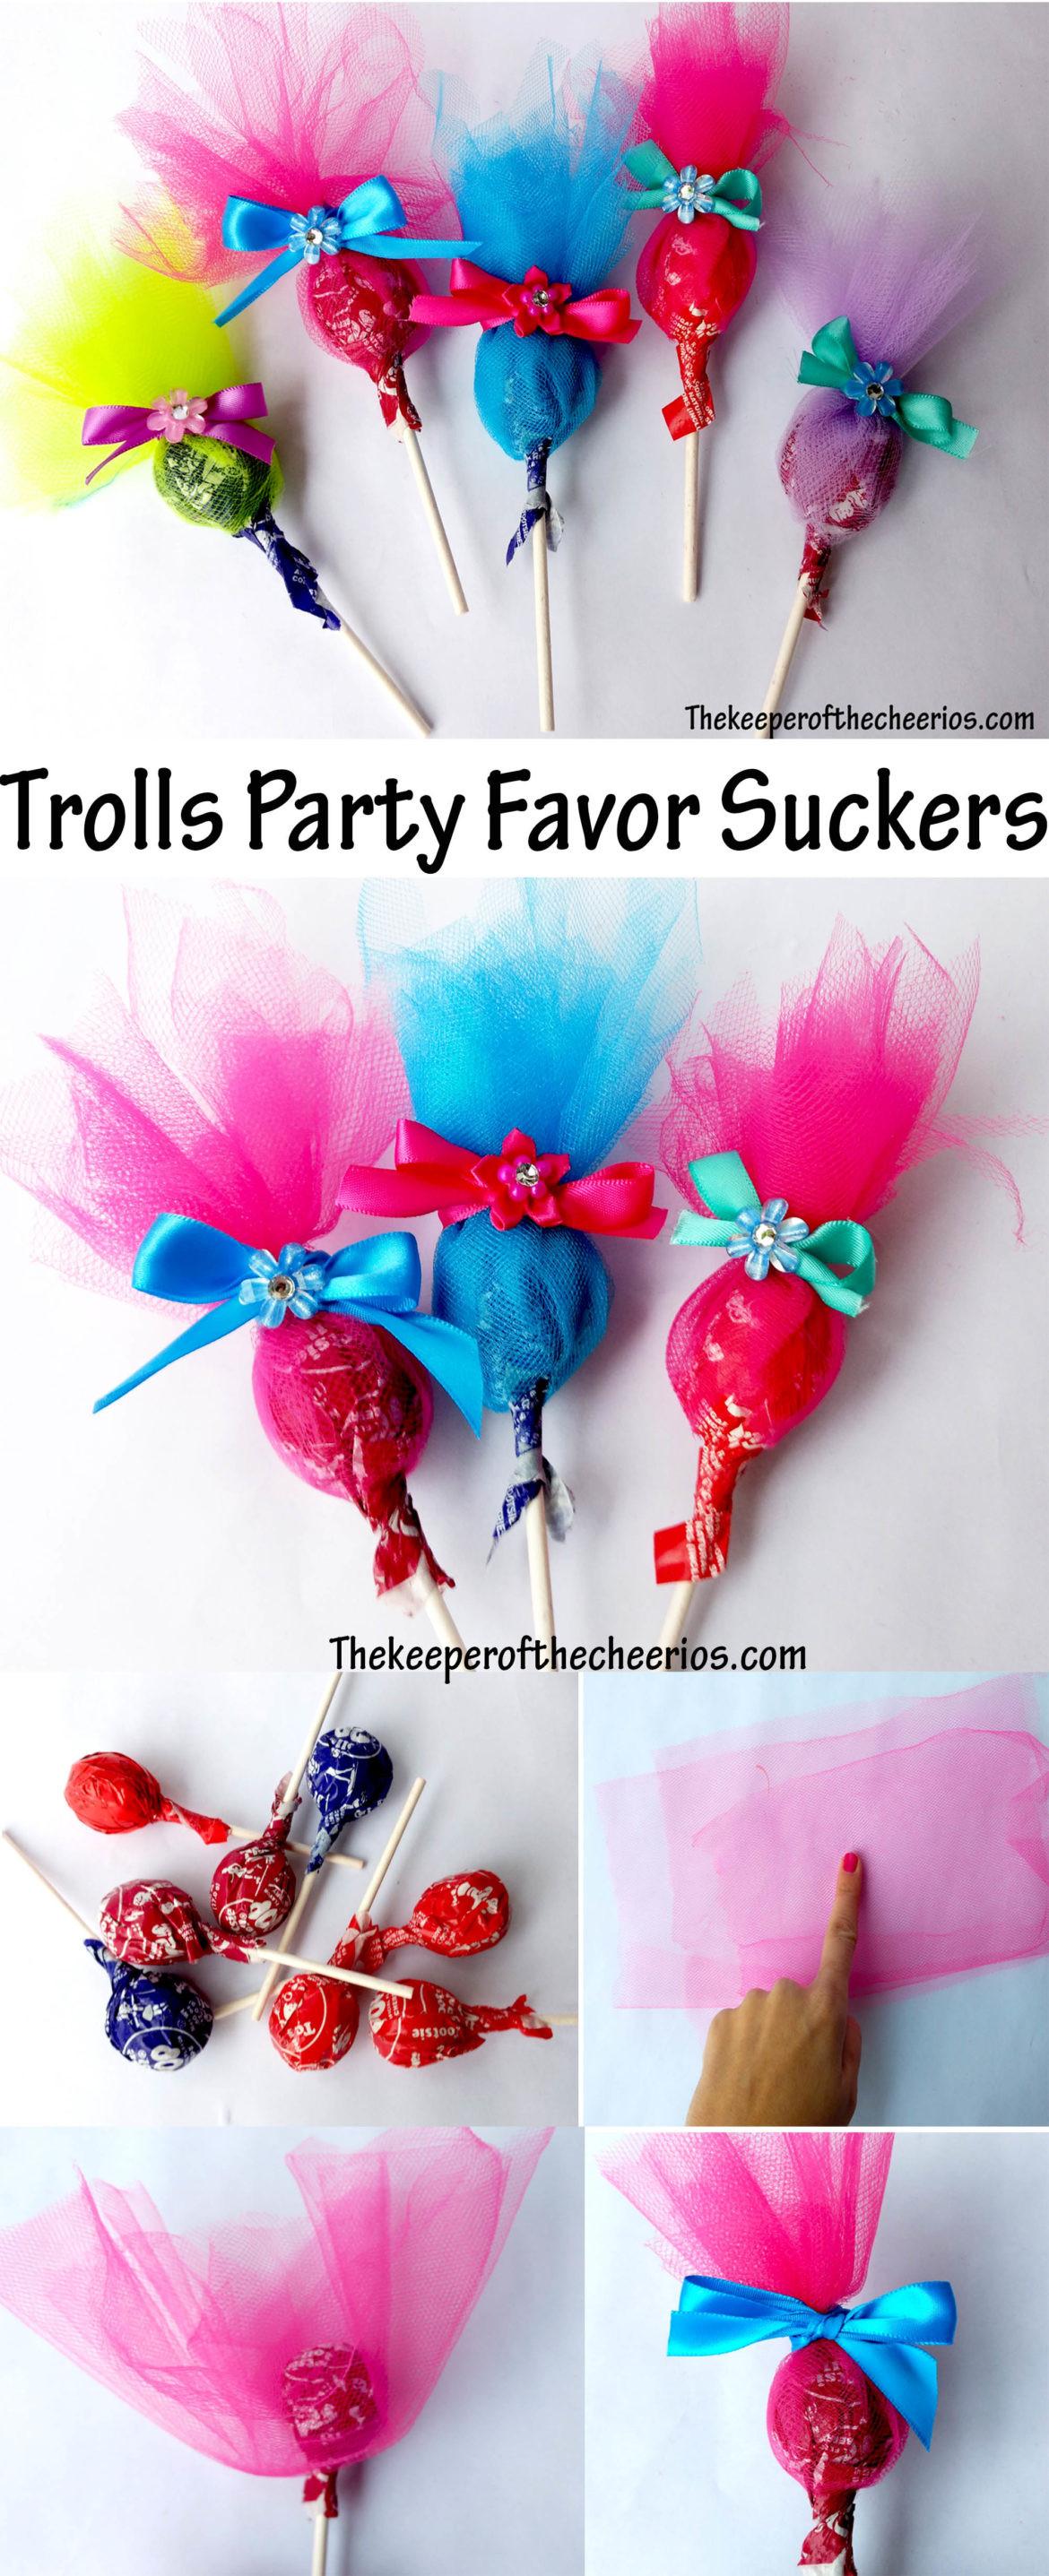 Diy Trolls Party Ideas  Trolls Party Favor Suckers